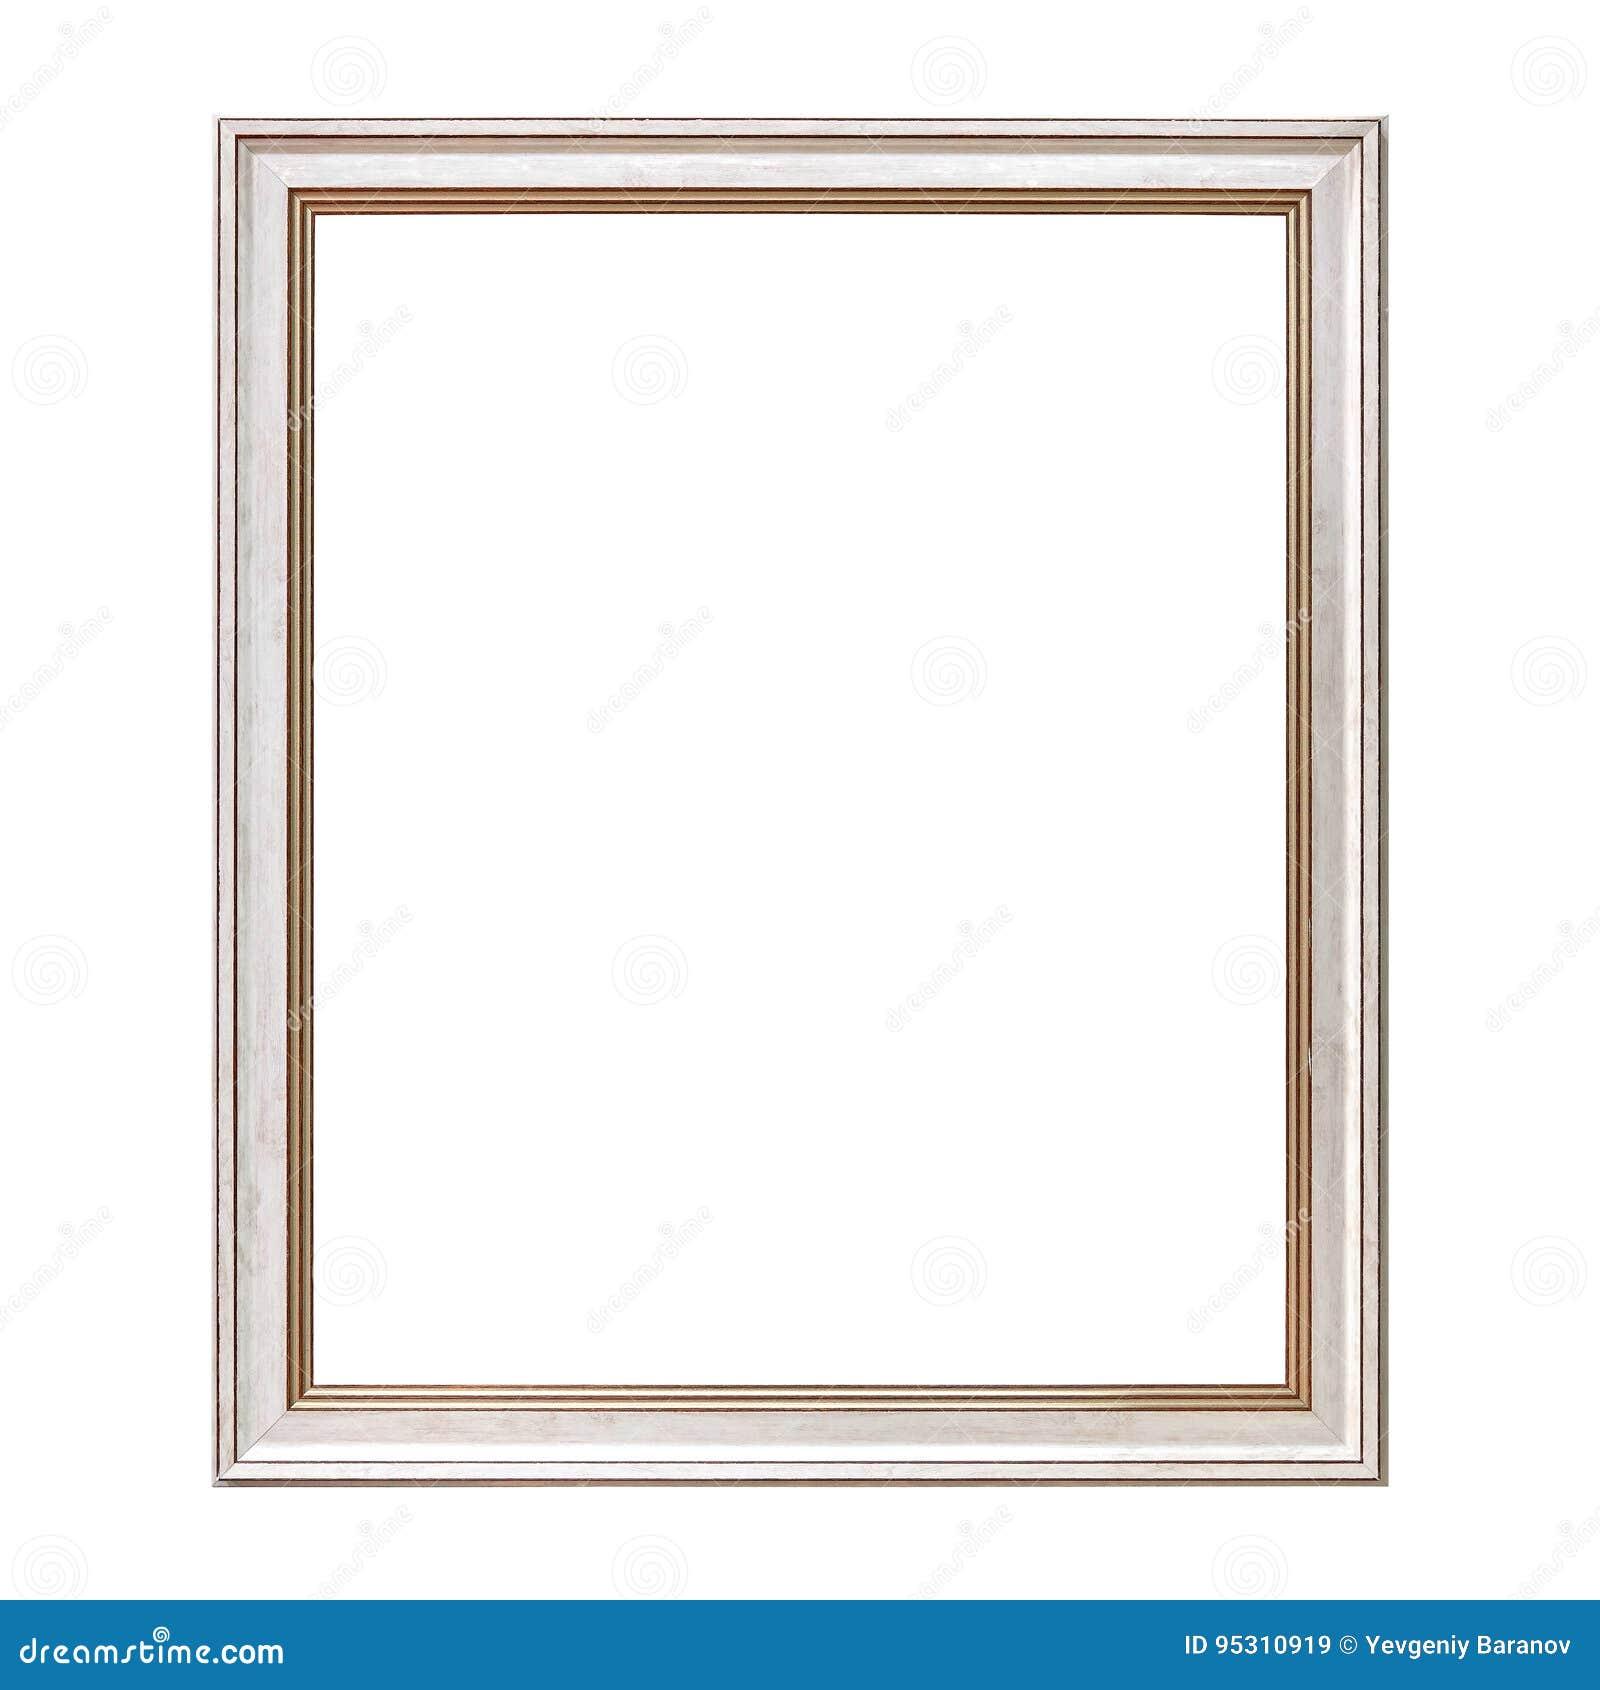 Framework In Antique Style. Vintage Picture Frame Stock Image ...